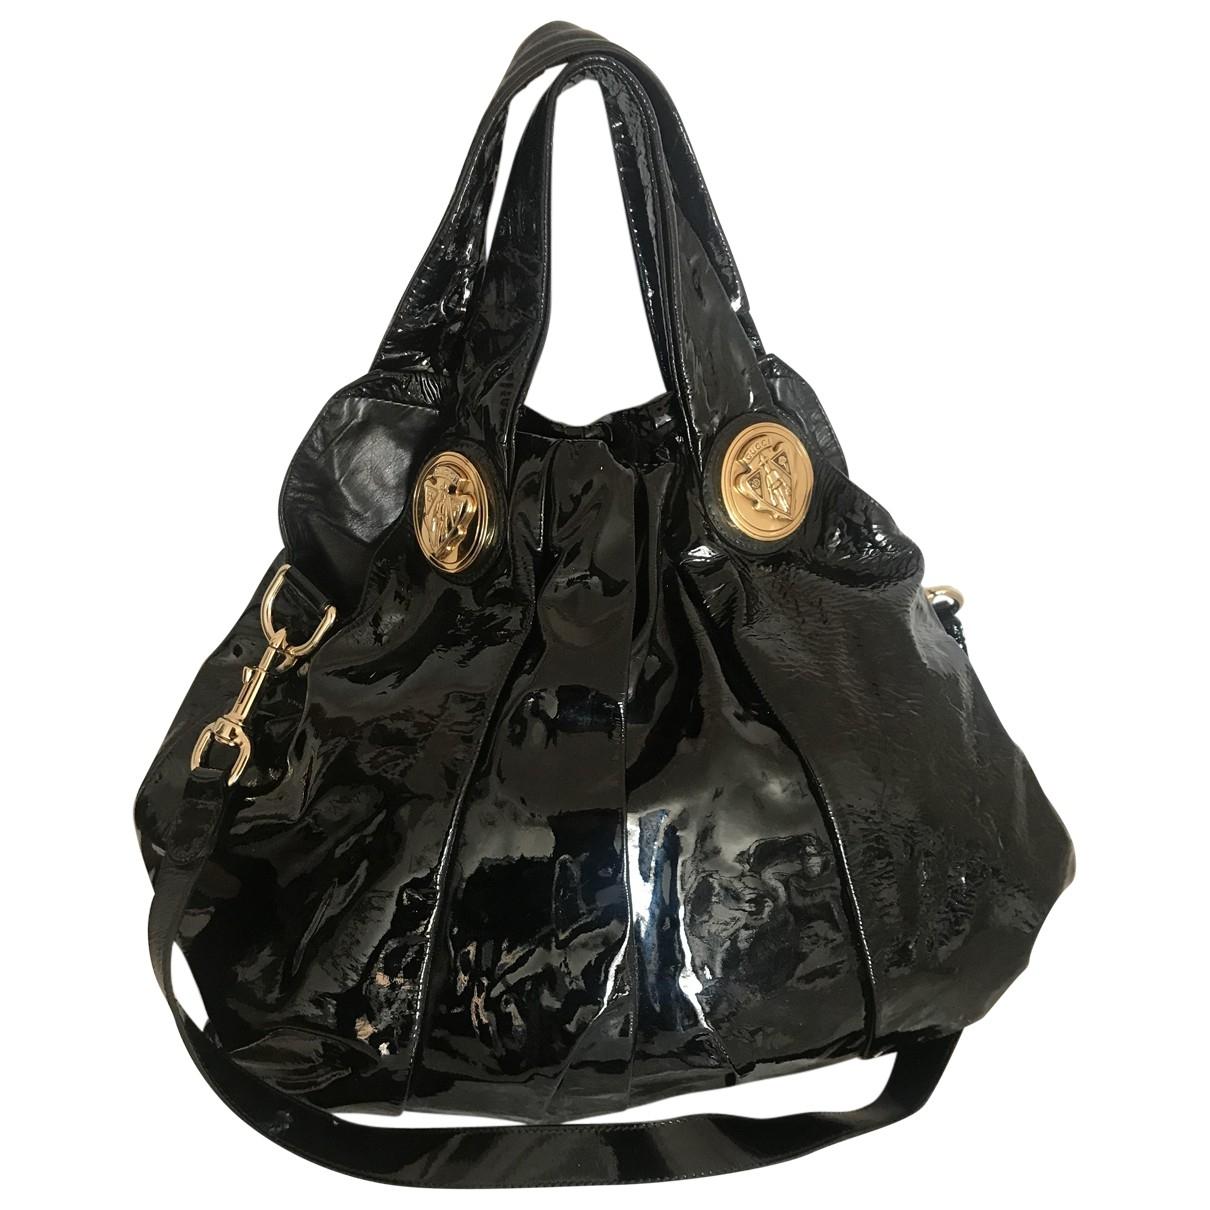 Gucci Hysteria Black Patent leather handbag for Women \N